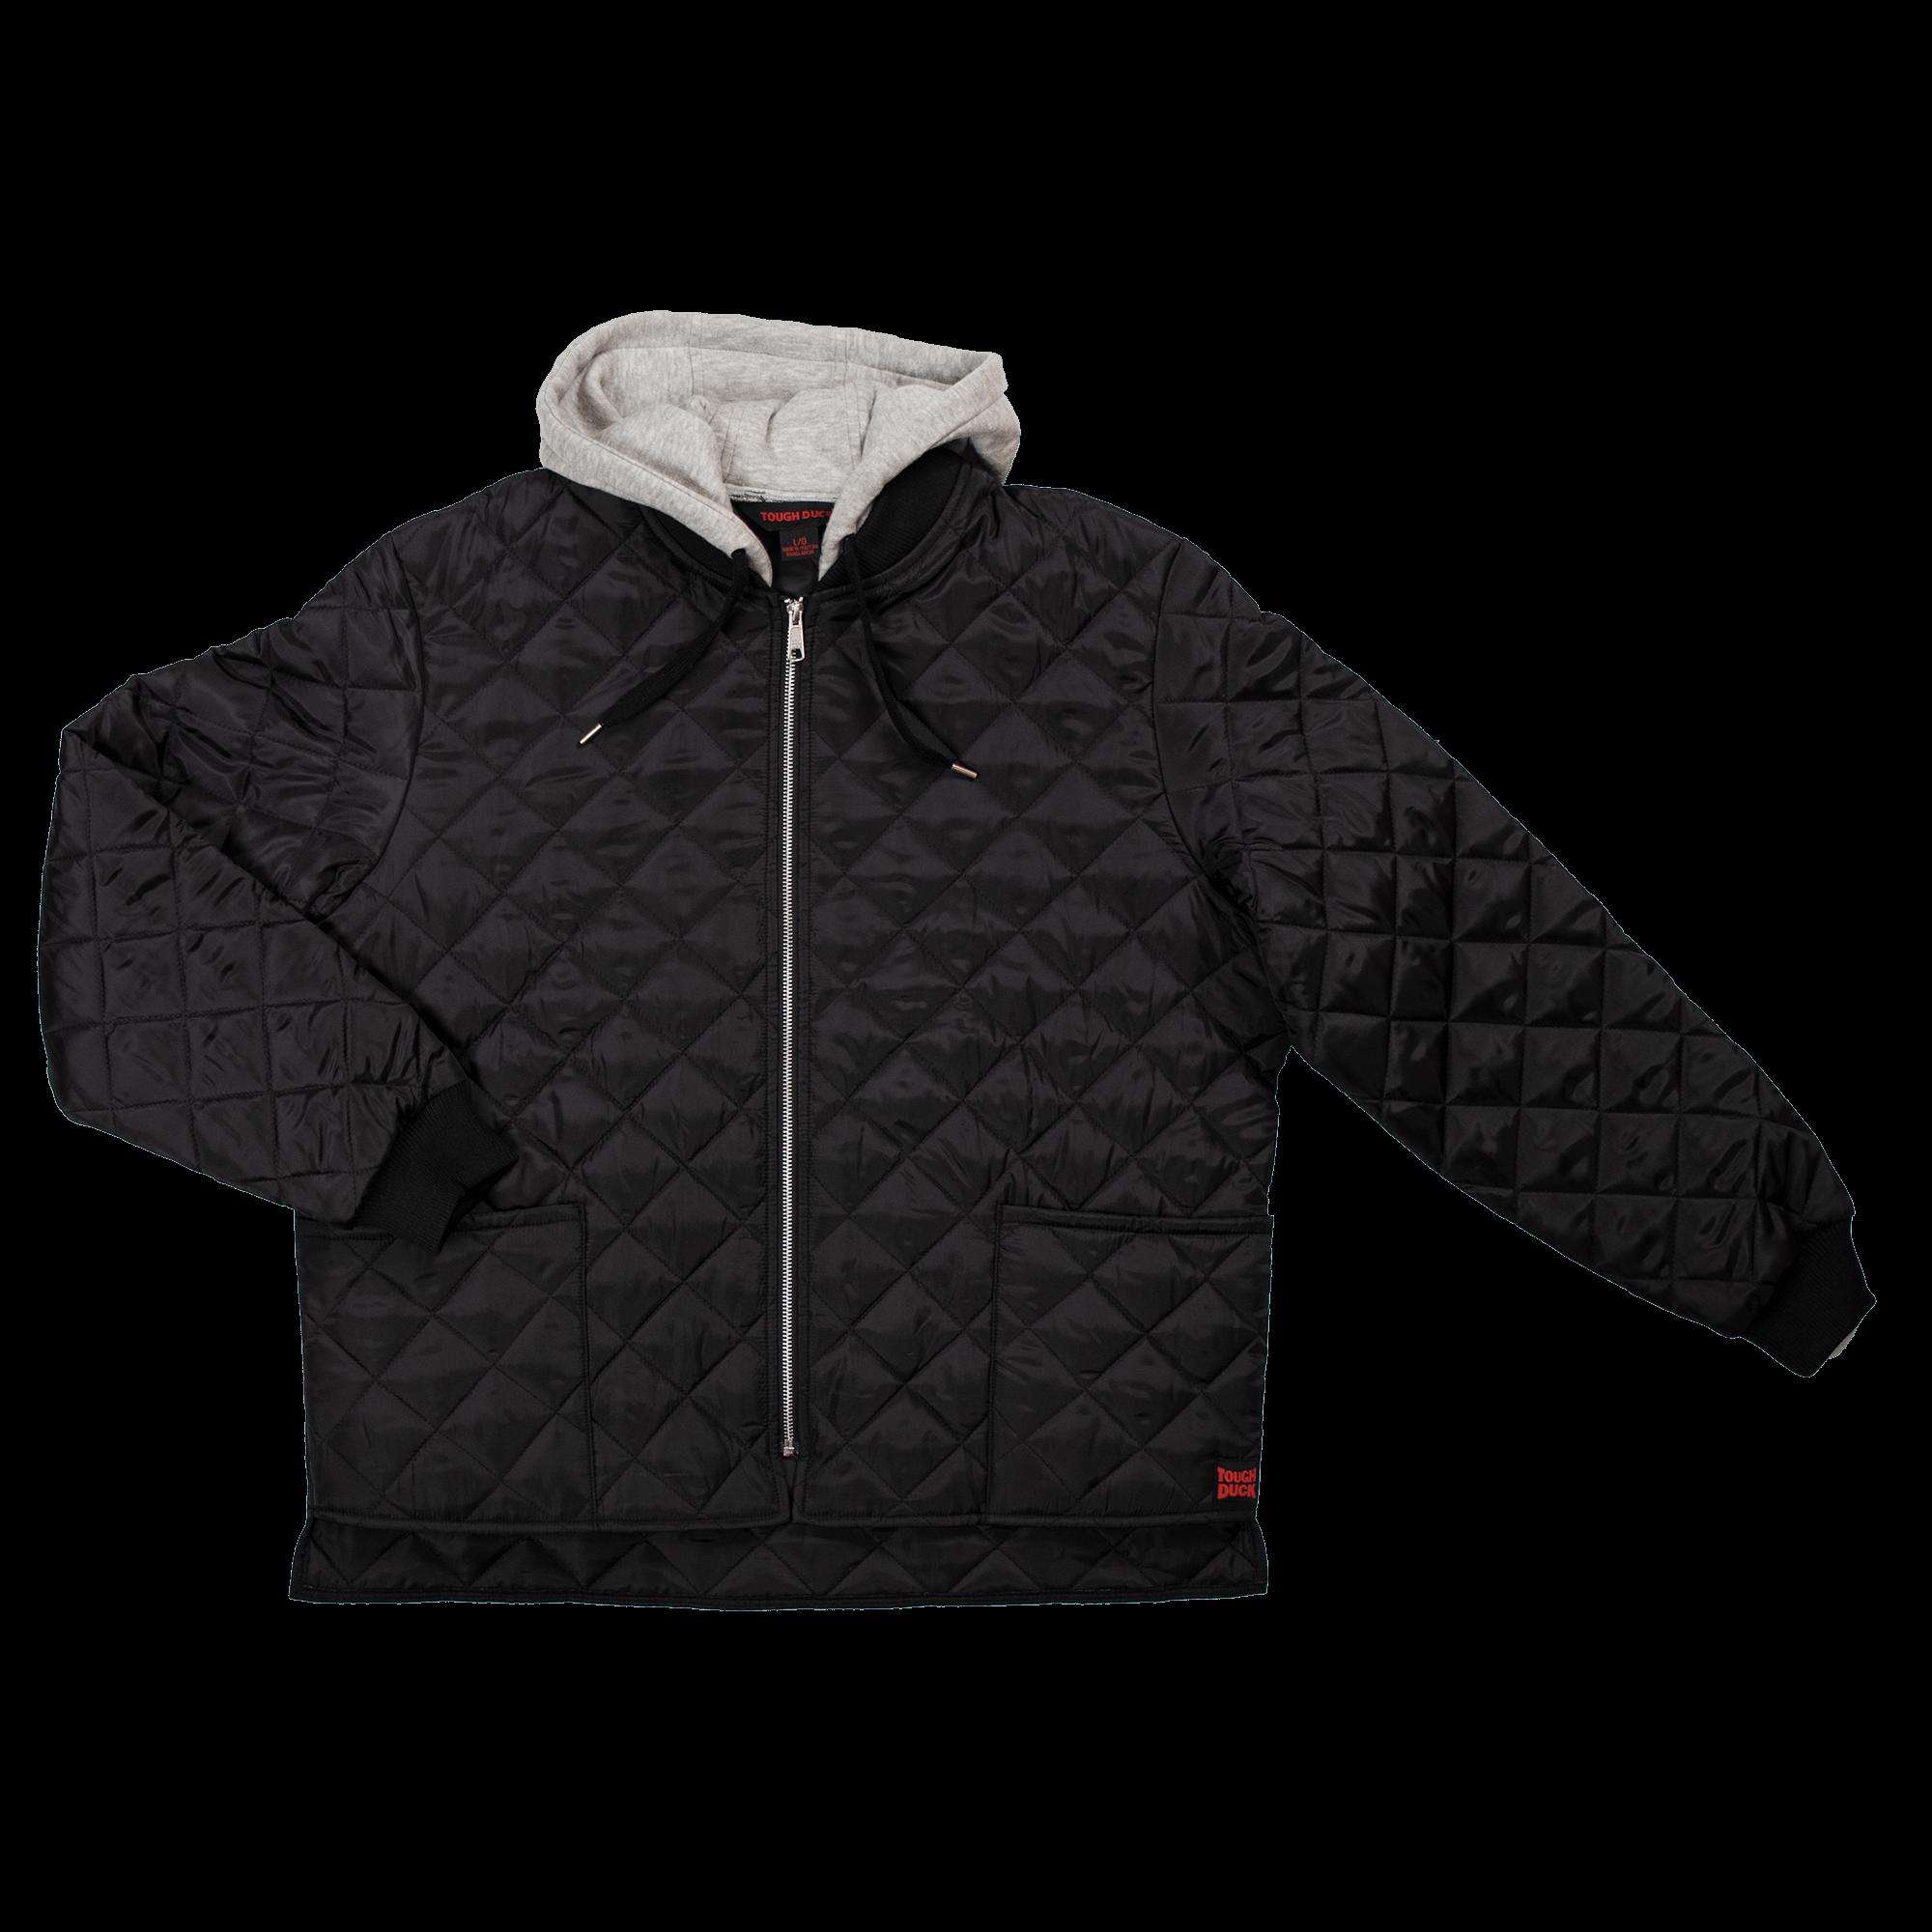 https://0901.nccdn.net/4_2/000/000/061/438/wj26-black-f-tough-duck-hooded-freezer-jacket-black-front.png